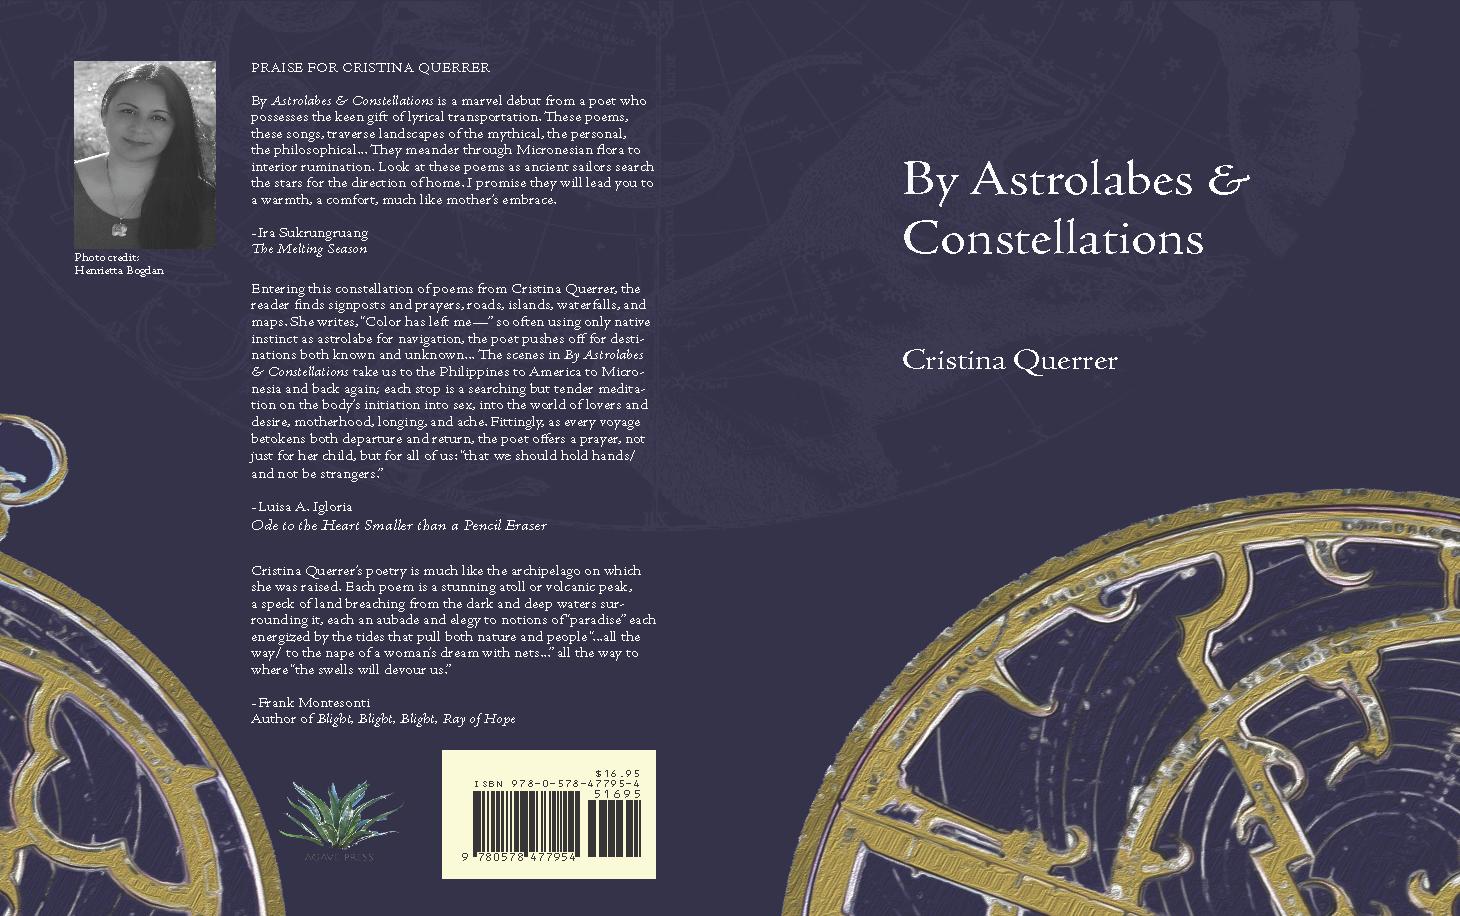 Book blurbs by  Frank Montesont i,  Luisa A. Igloria  and  Ira Sukrungraung